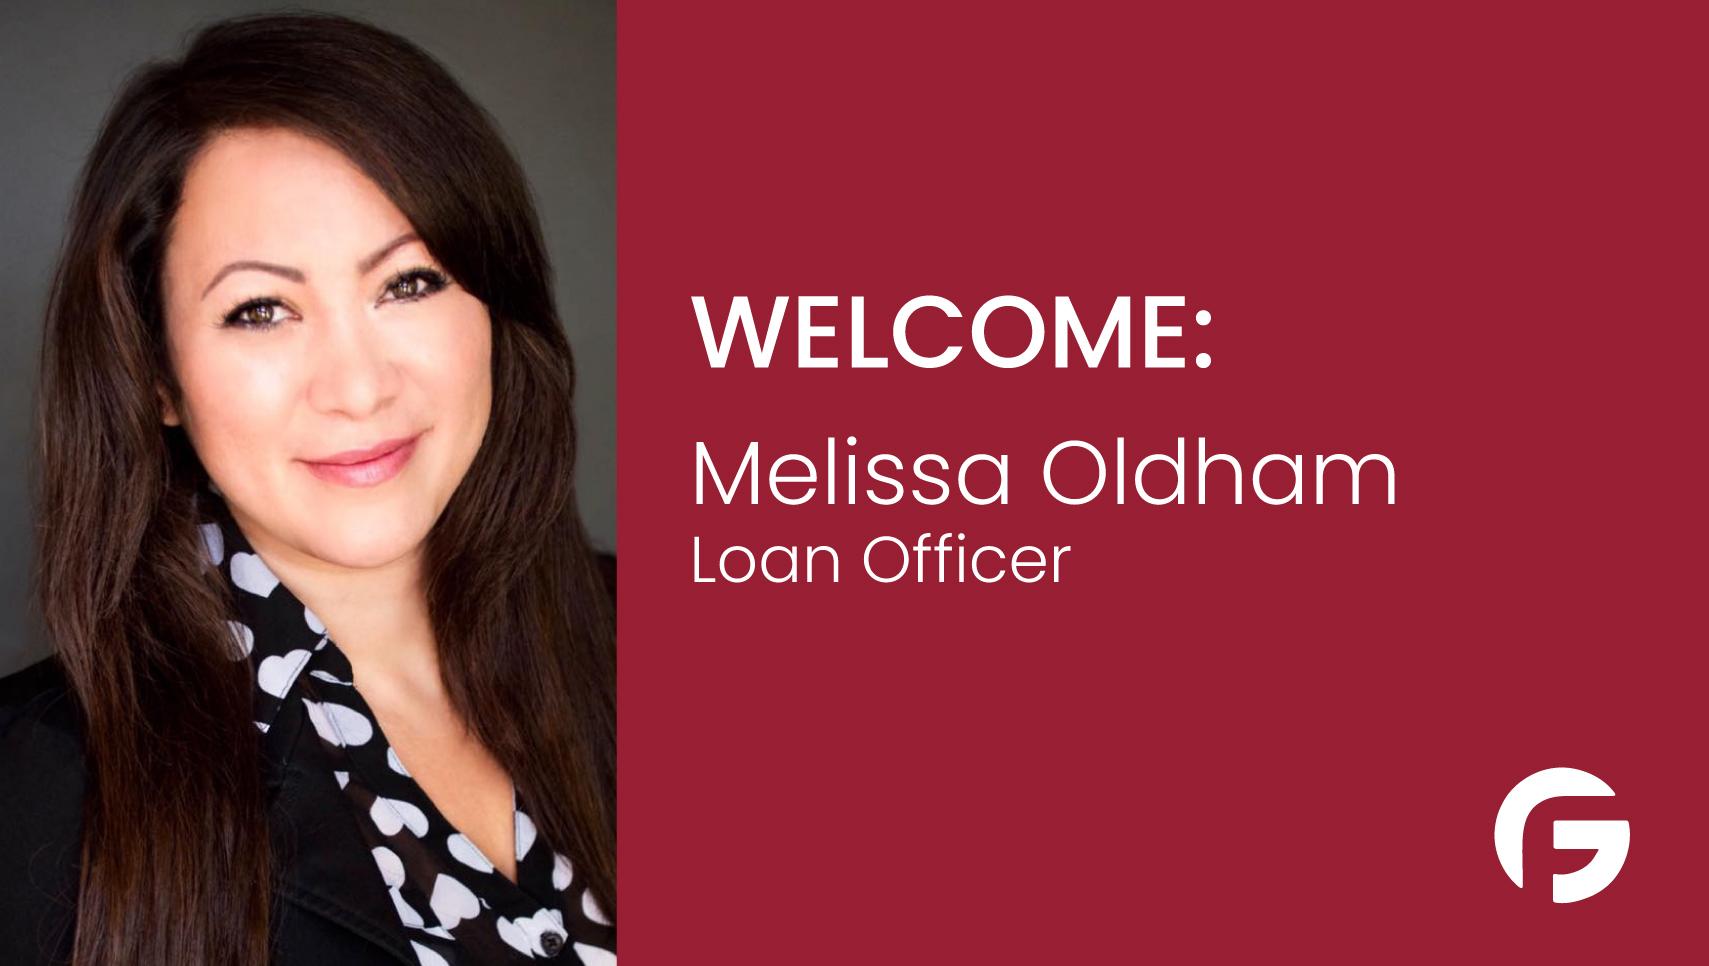 Melissa Oldham Loan Originator, Phoenix, Arizona